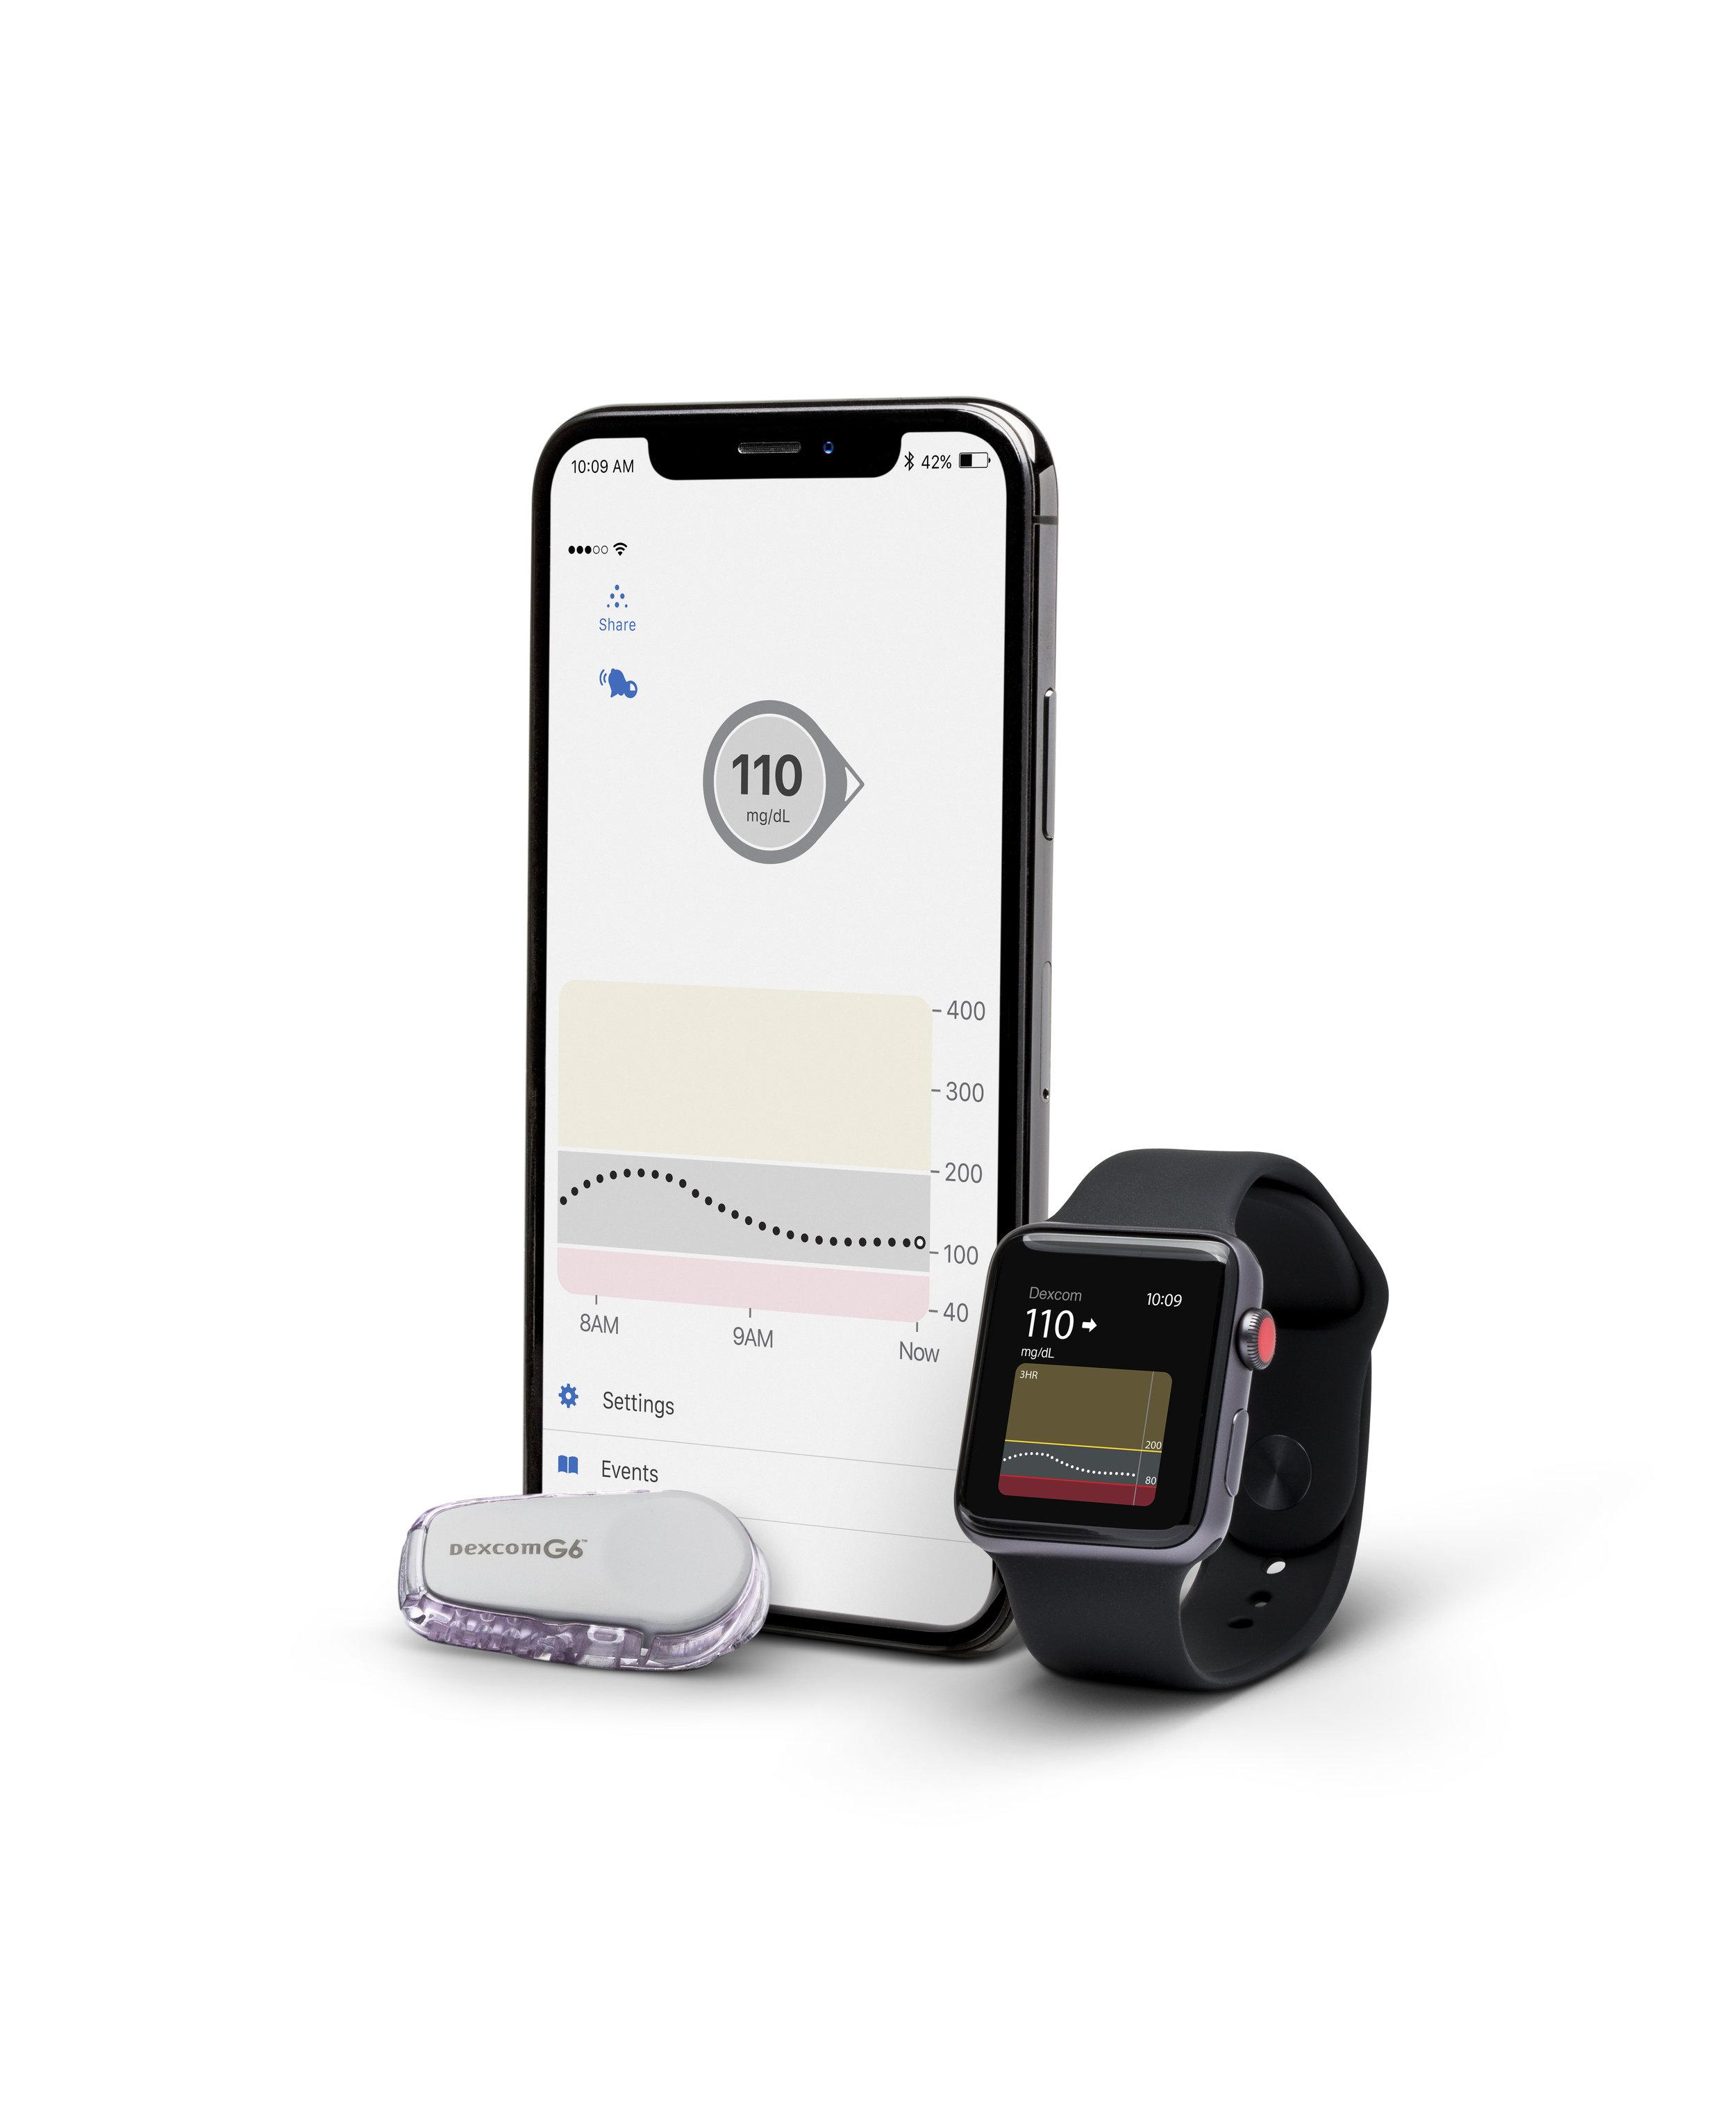 Dexcom G6 and Apple Watch